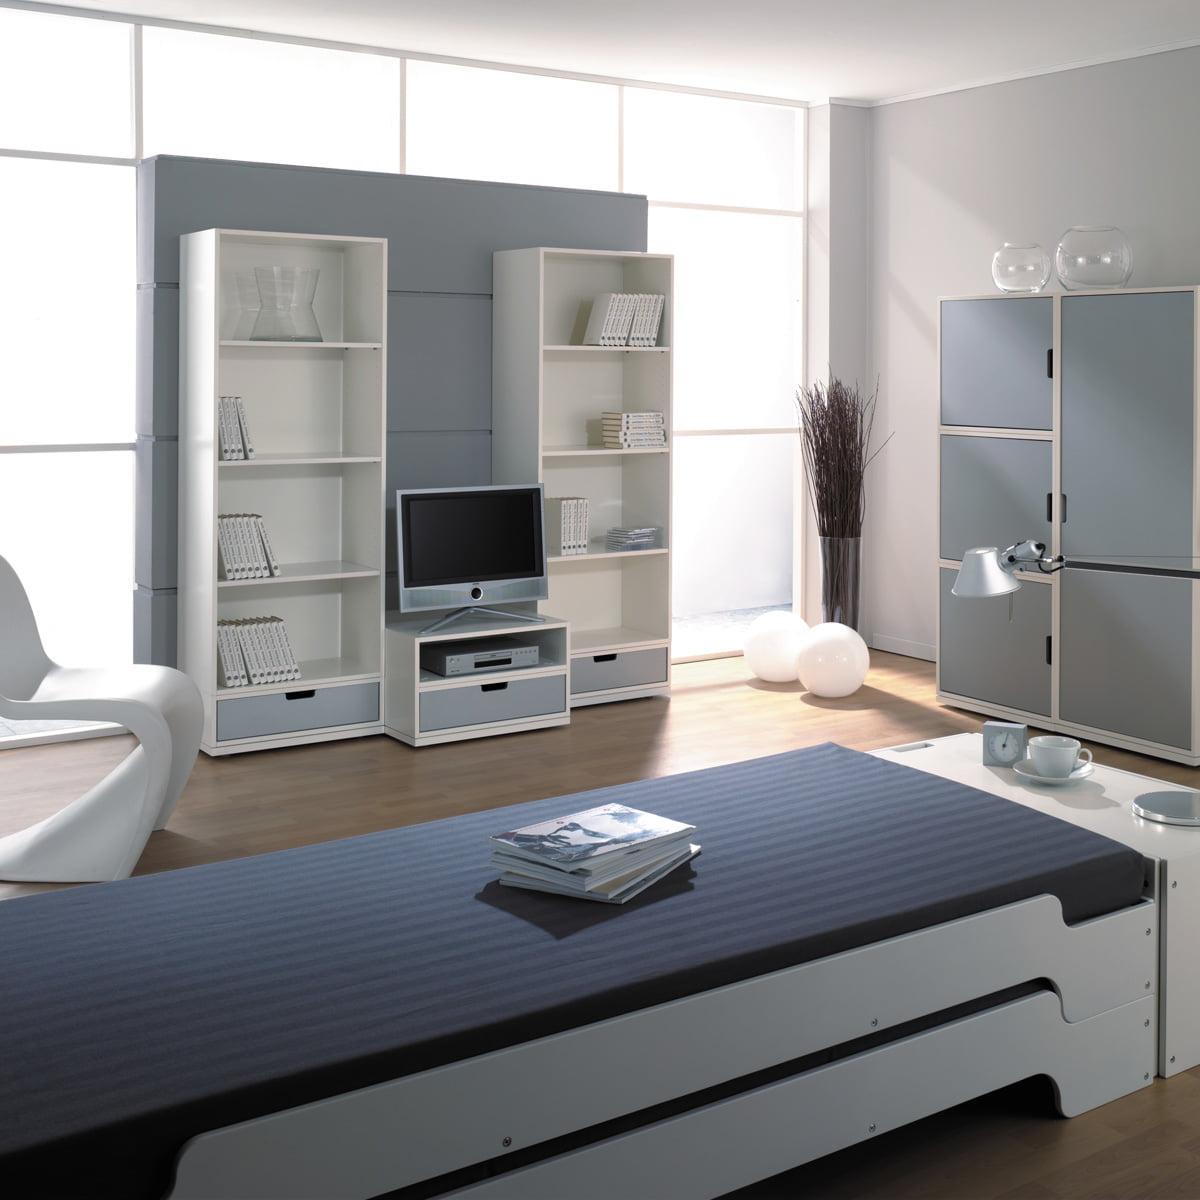 rolf heide stapelliege im wohndesign shoo kaufen. Black Bedroom Furniture Sets. Home Design Ideas